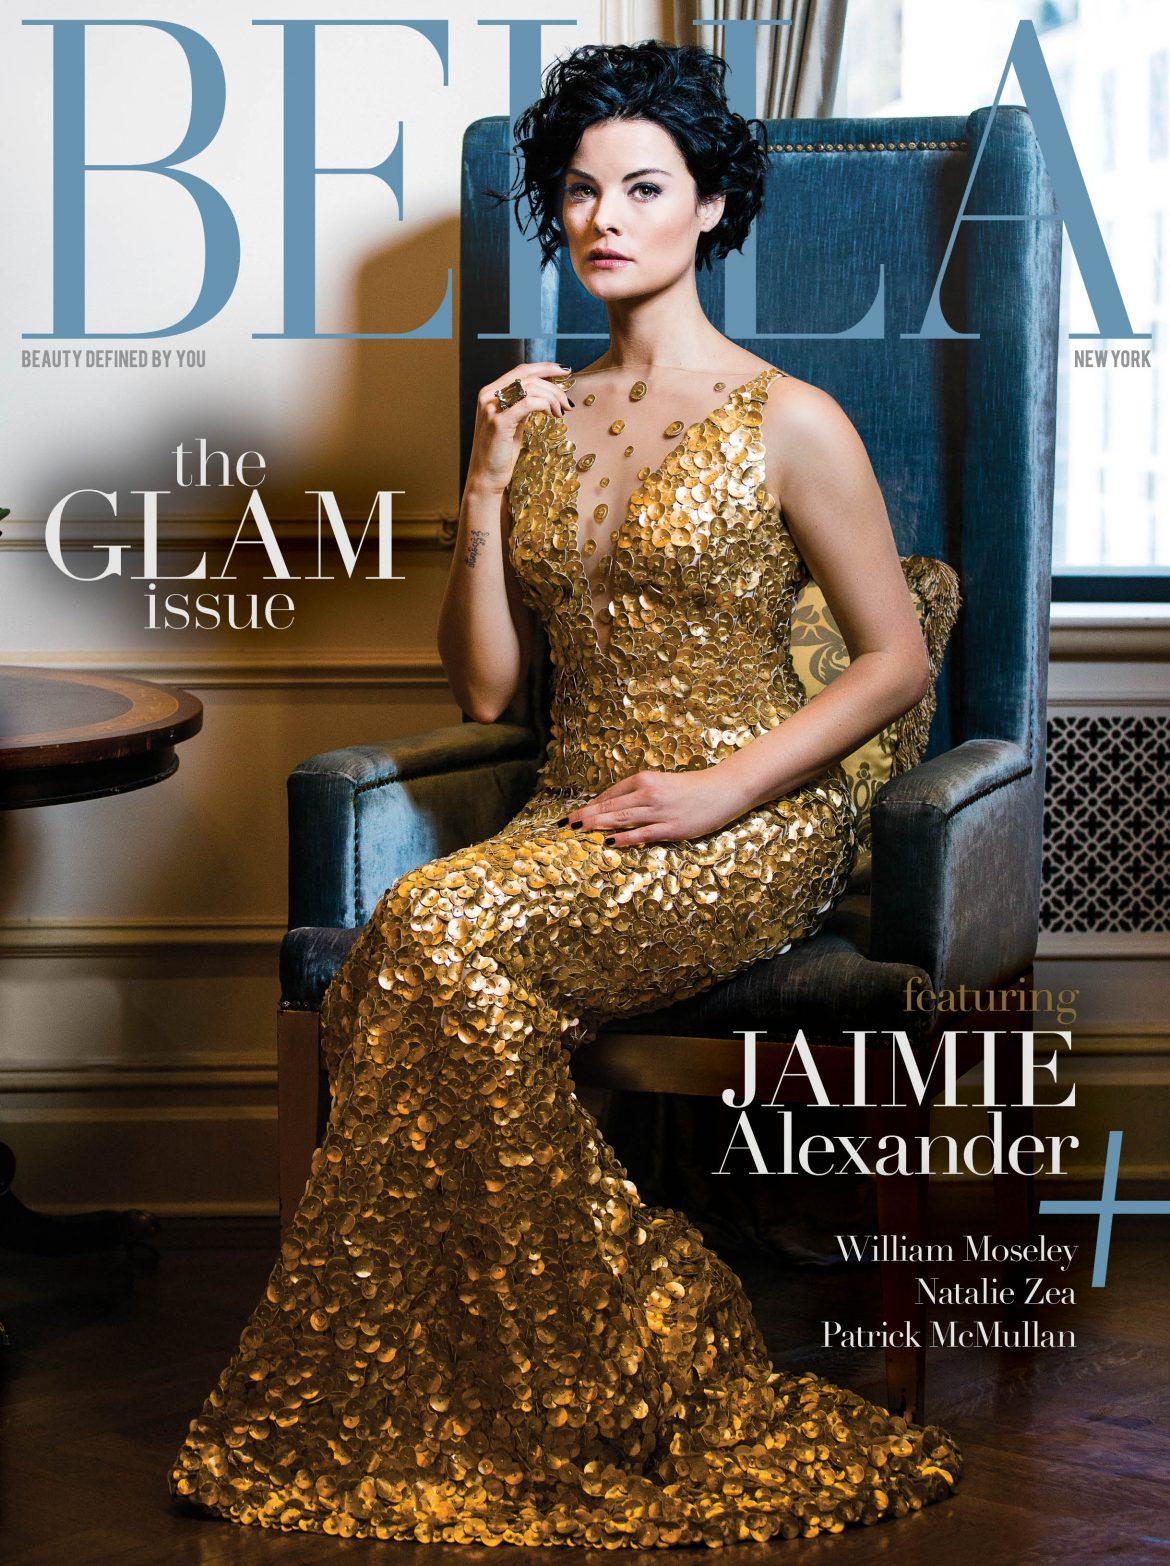 Jaimie Alexander for Bella New York Magazine January/February 2017.